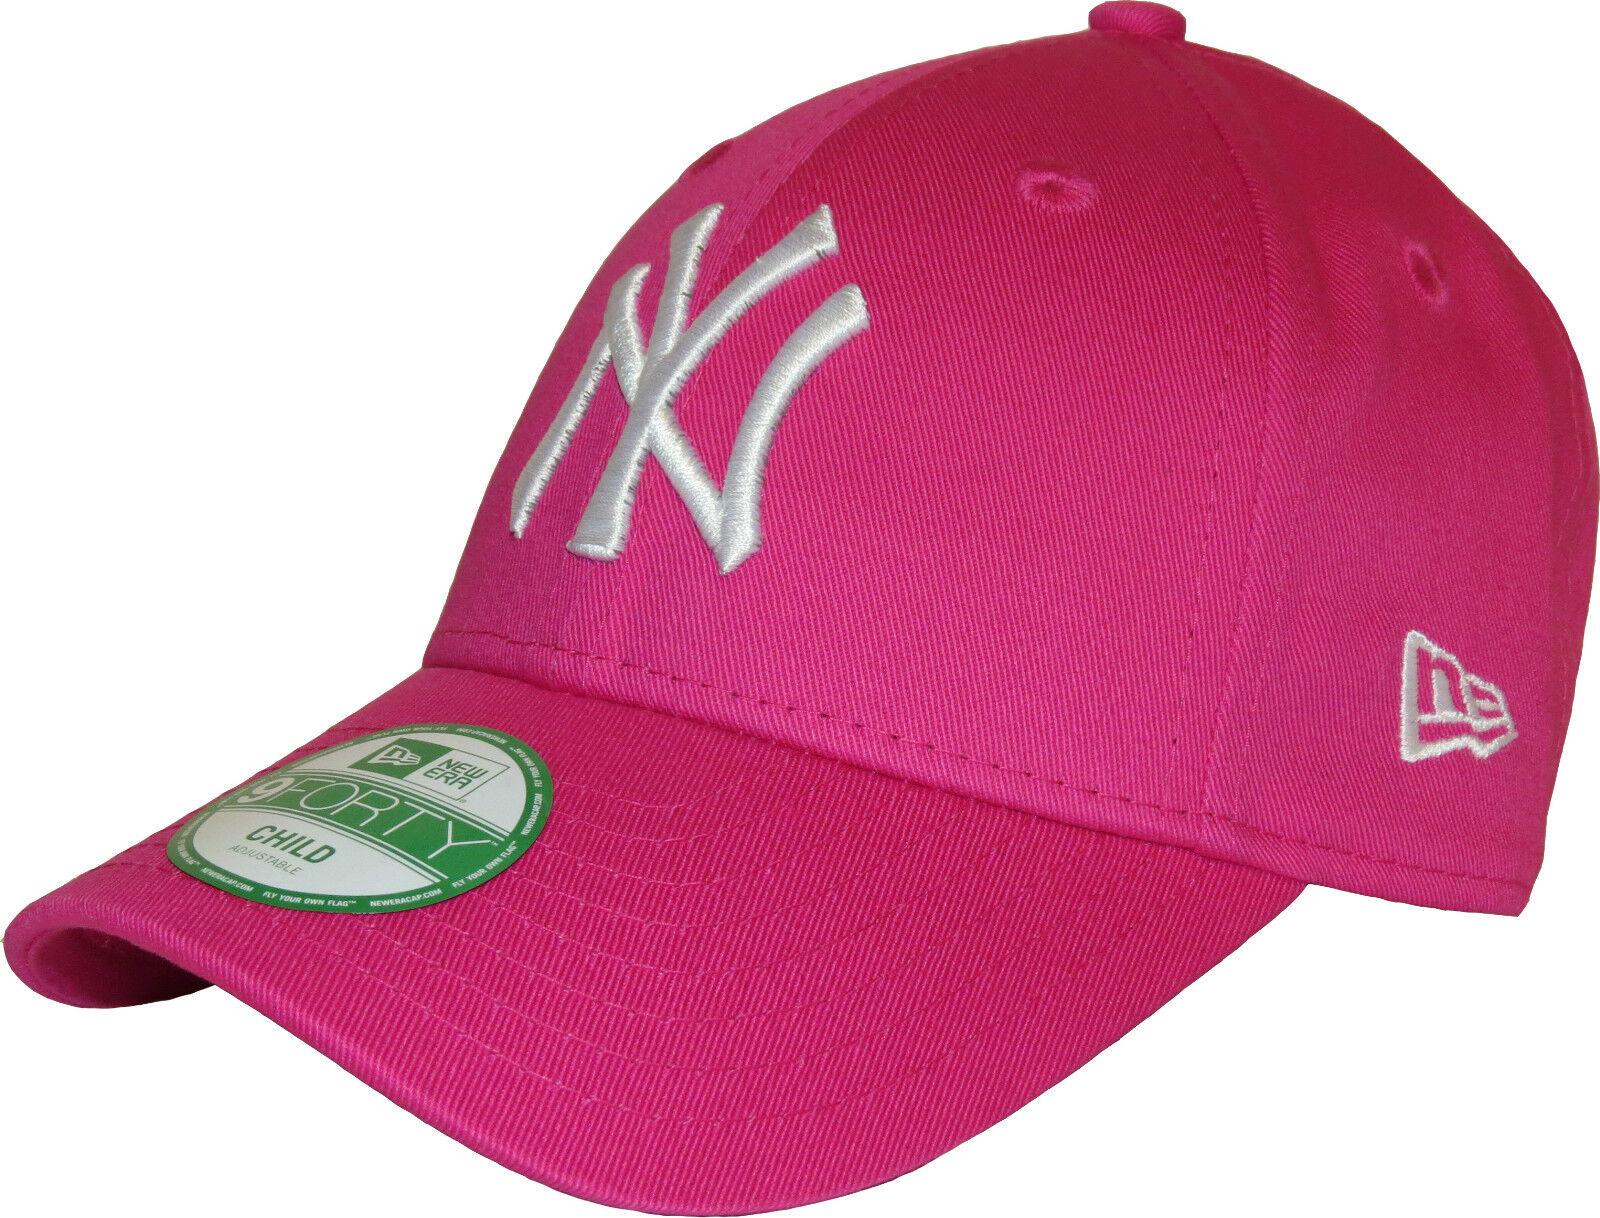 Era 9forty Girls NY Yankees Pink Adjustable Baseball Cap Youth (6 - 10  Years Old)  e71043ab303